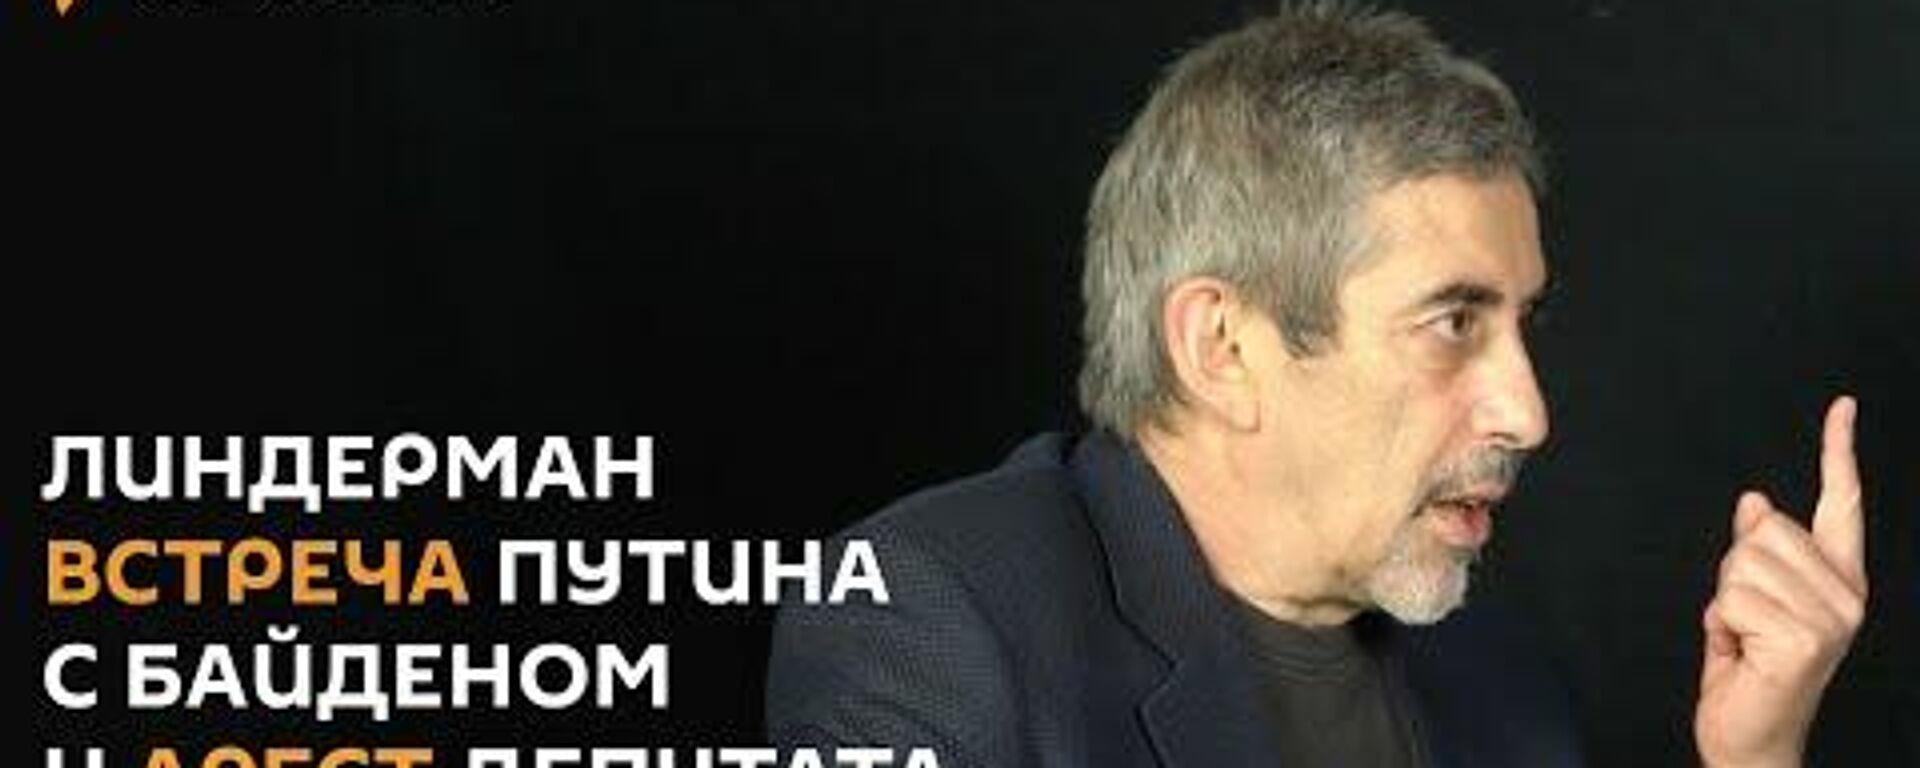 Линдерман: арест депутата Сейма Латвии - провокация Риги перед встречей в Женеве? - Sputnik Латвия, 1920, 19.06.2021